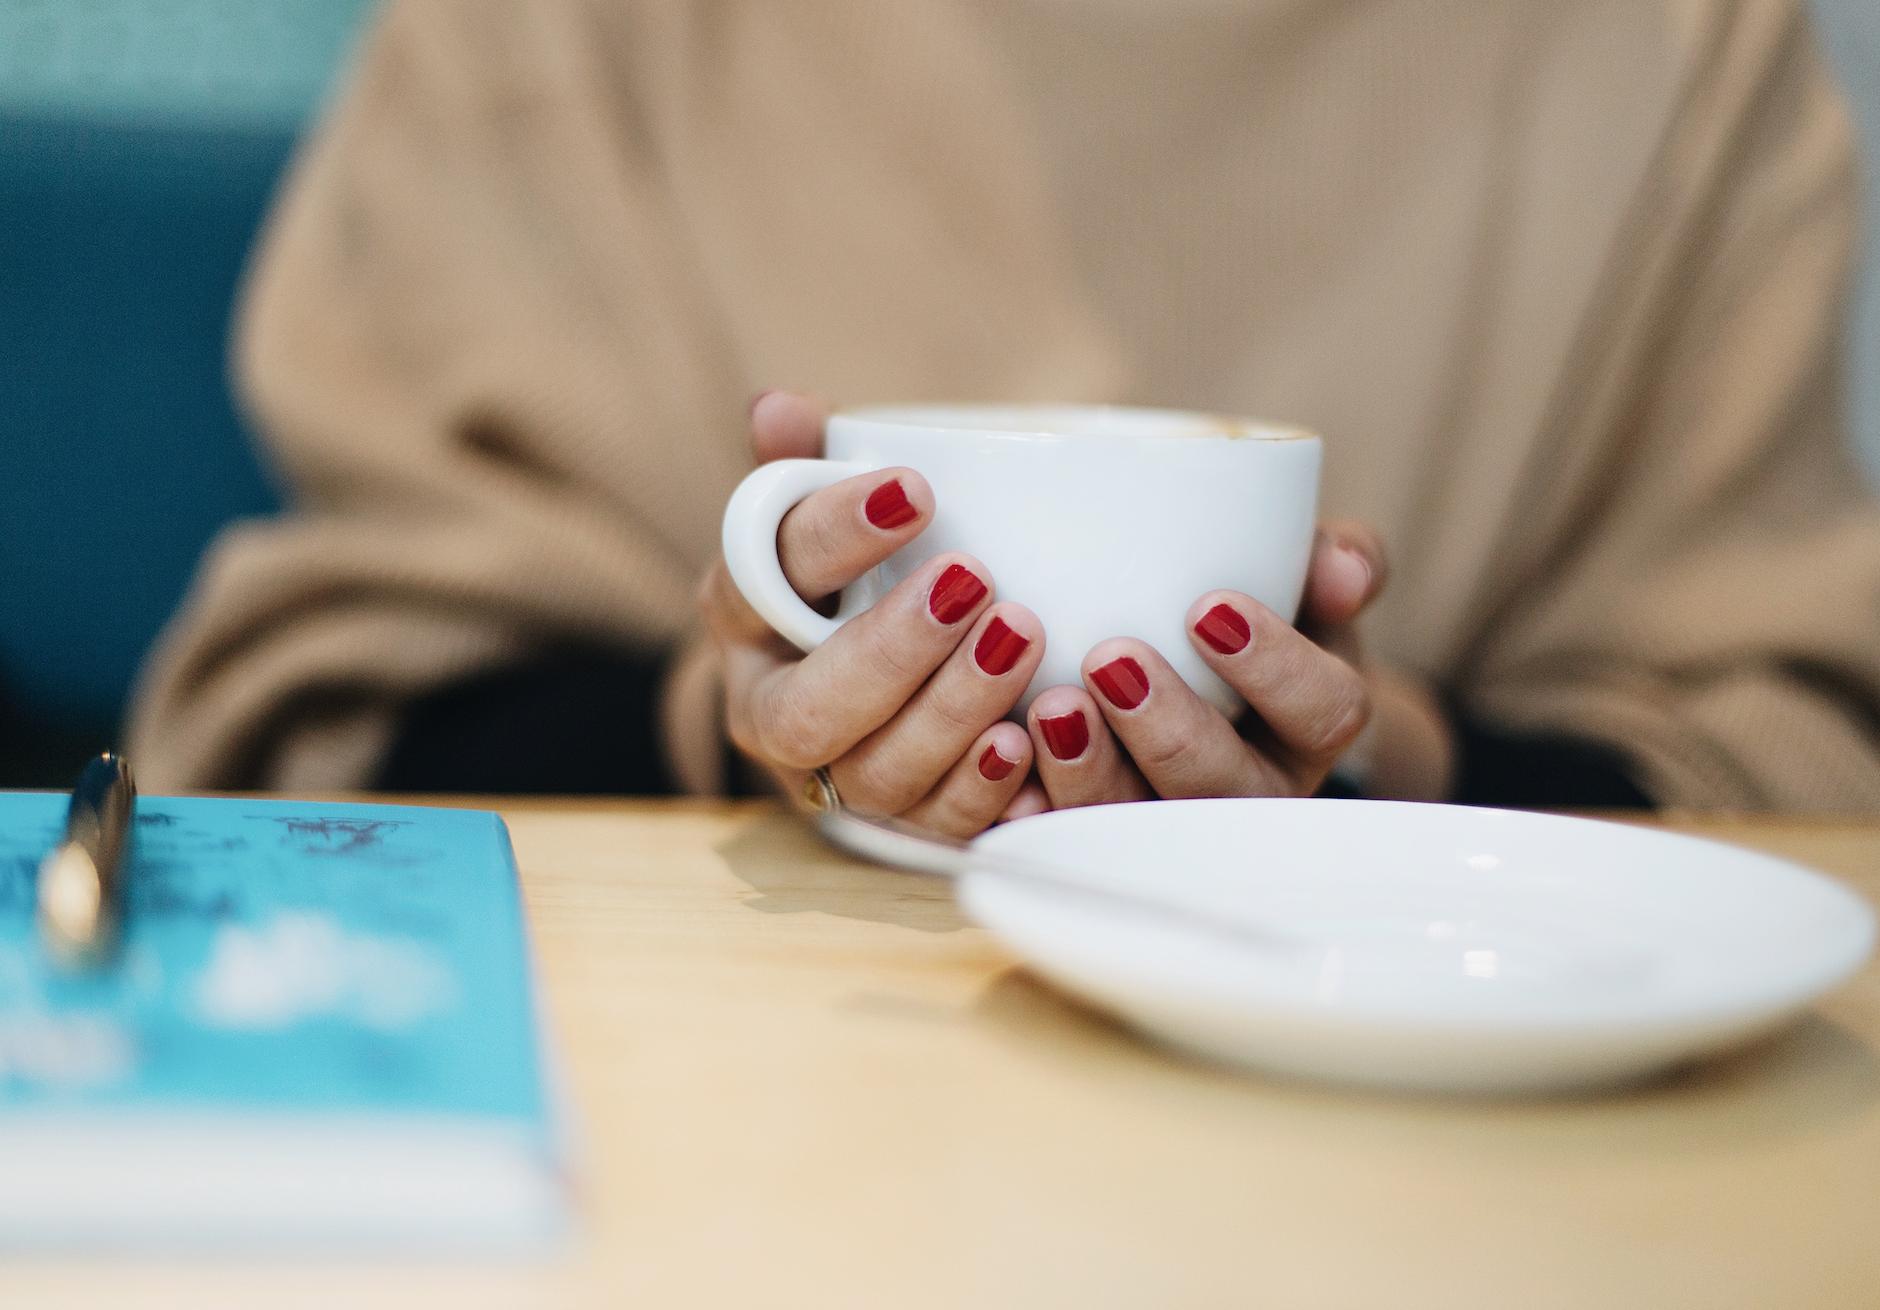 Sylwia holding coffee mug